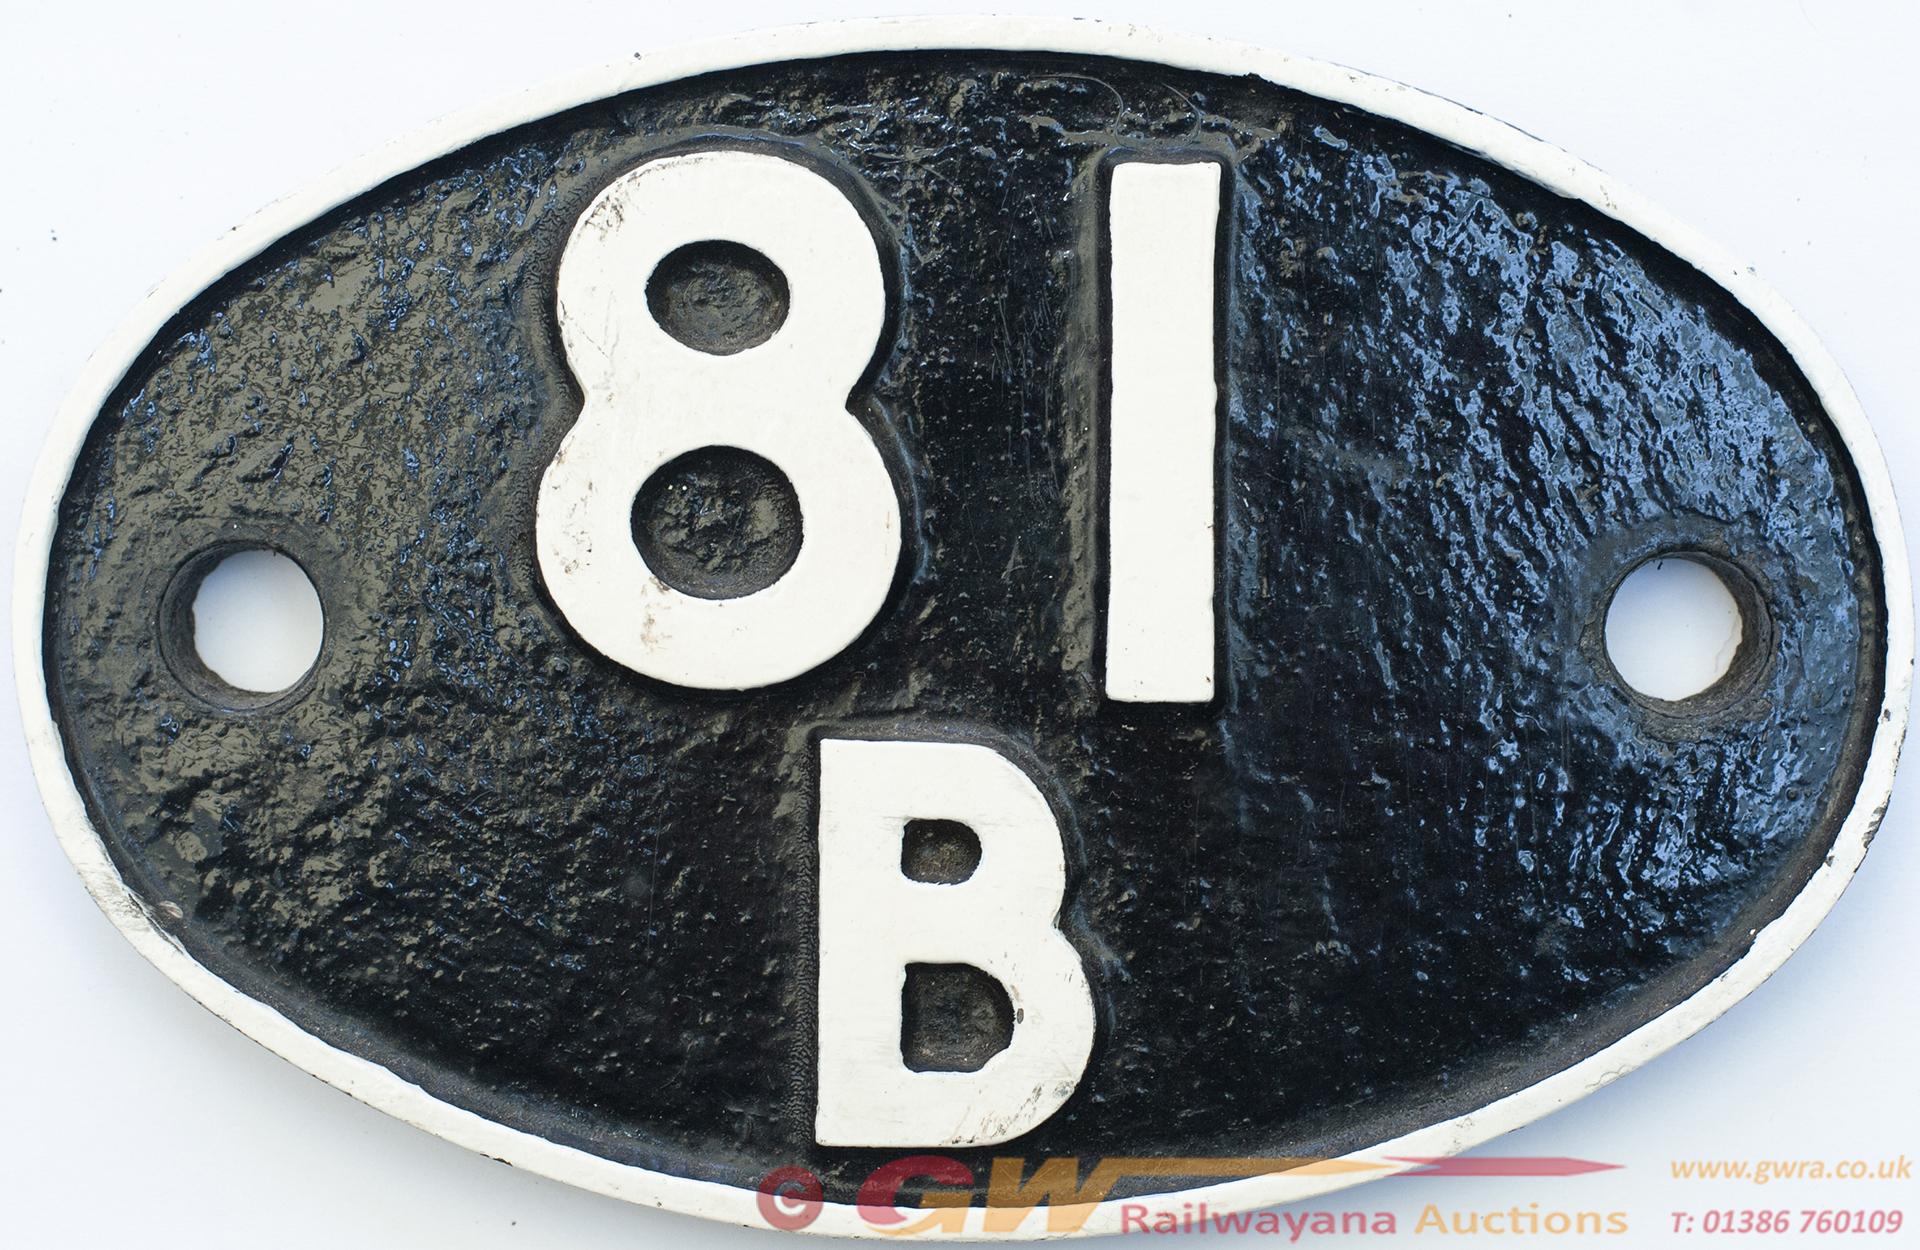 Shedplate 81b Slough 1950-1964 With Sub Sheds